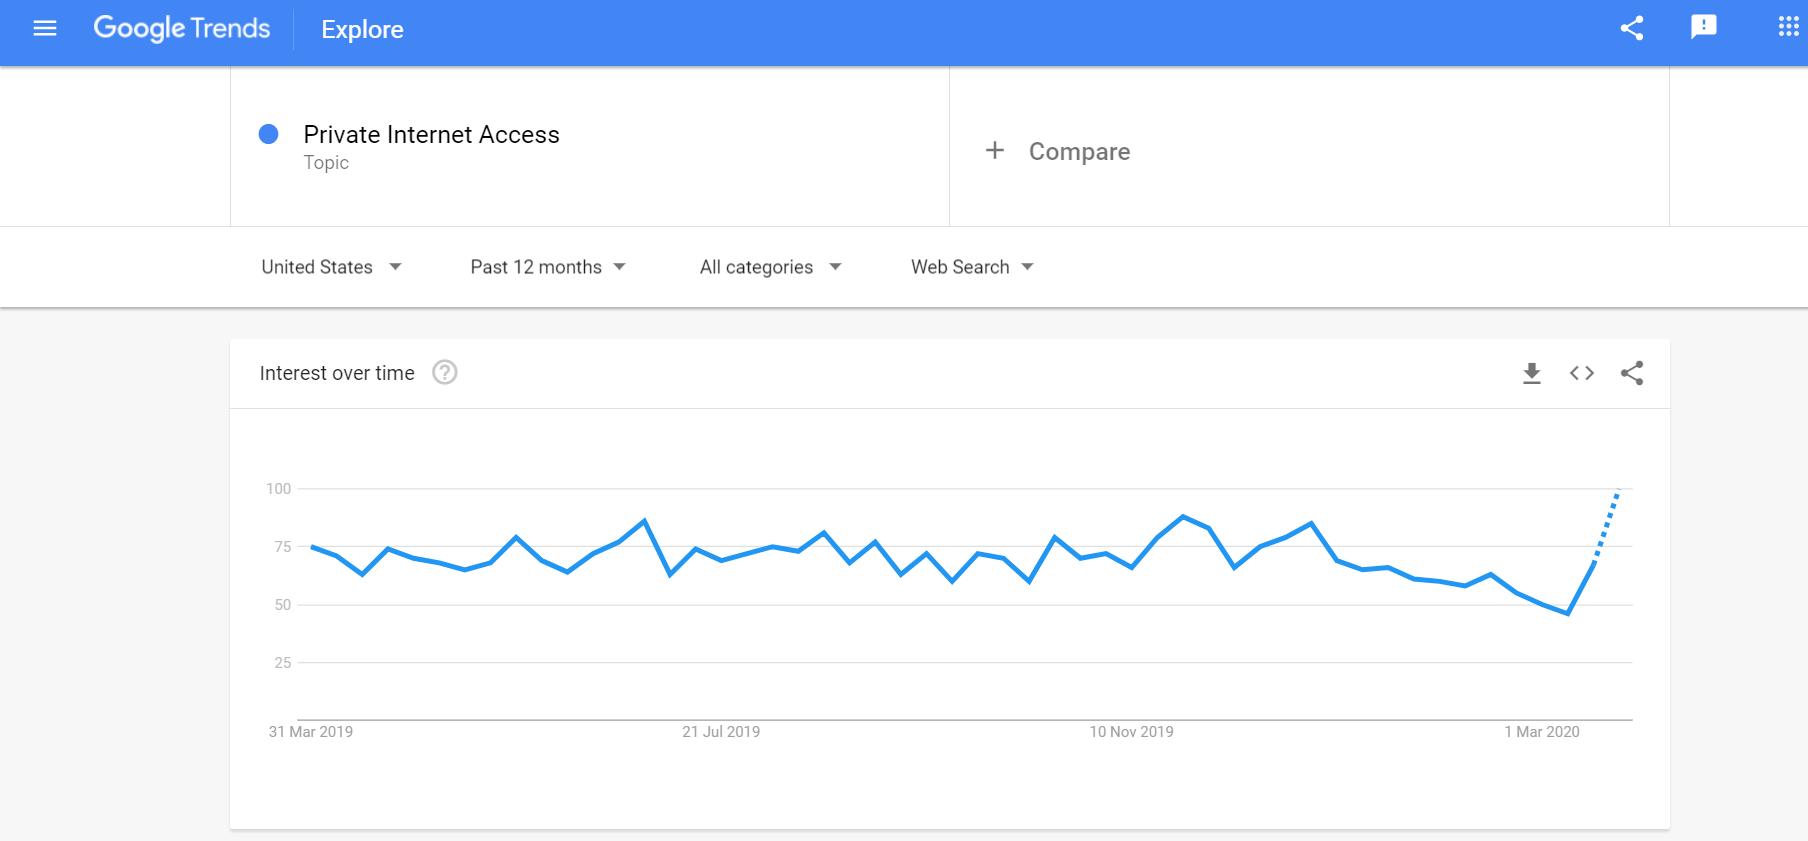 Private Internet Access Google Trends